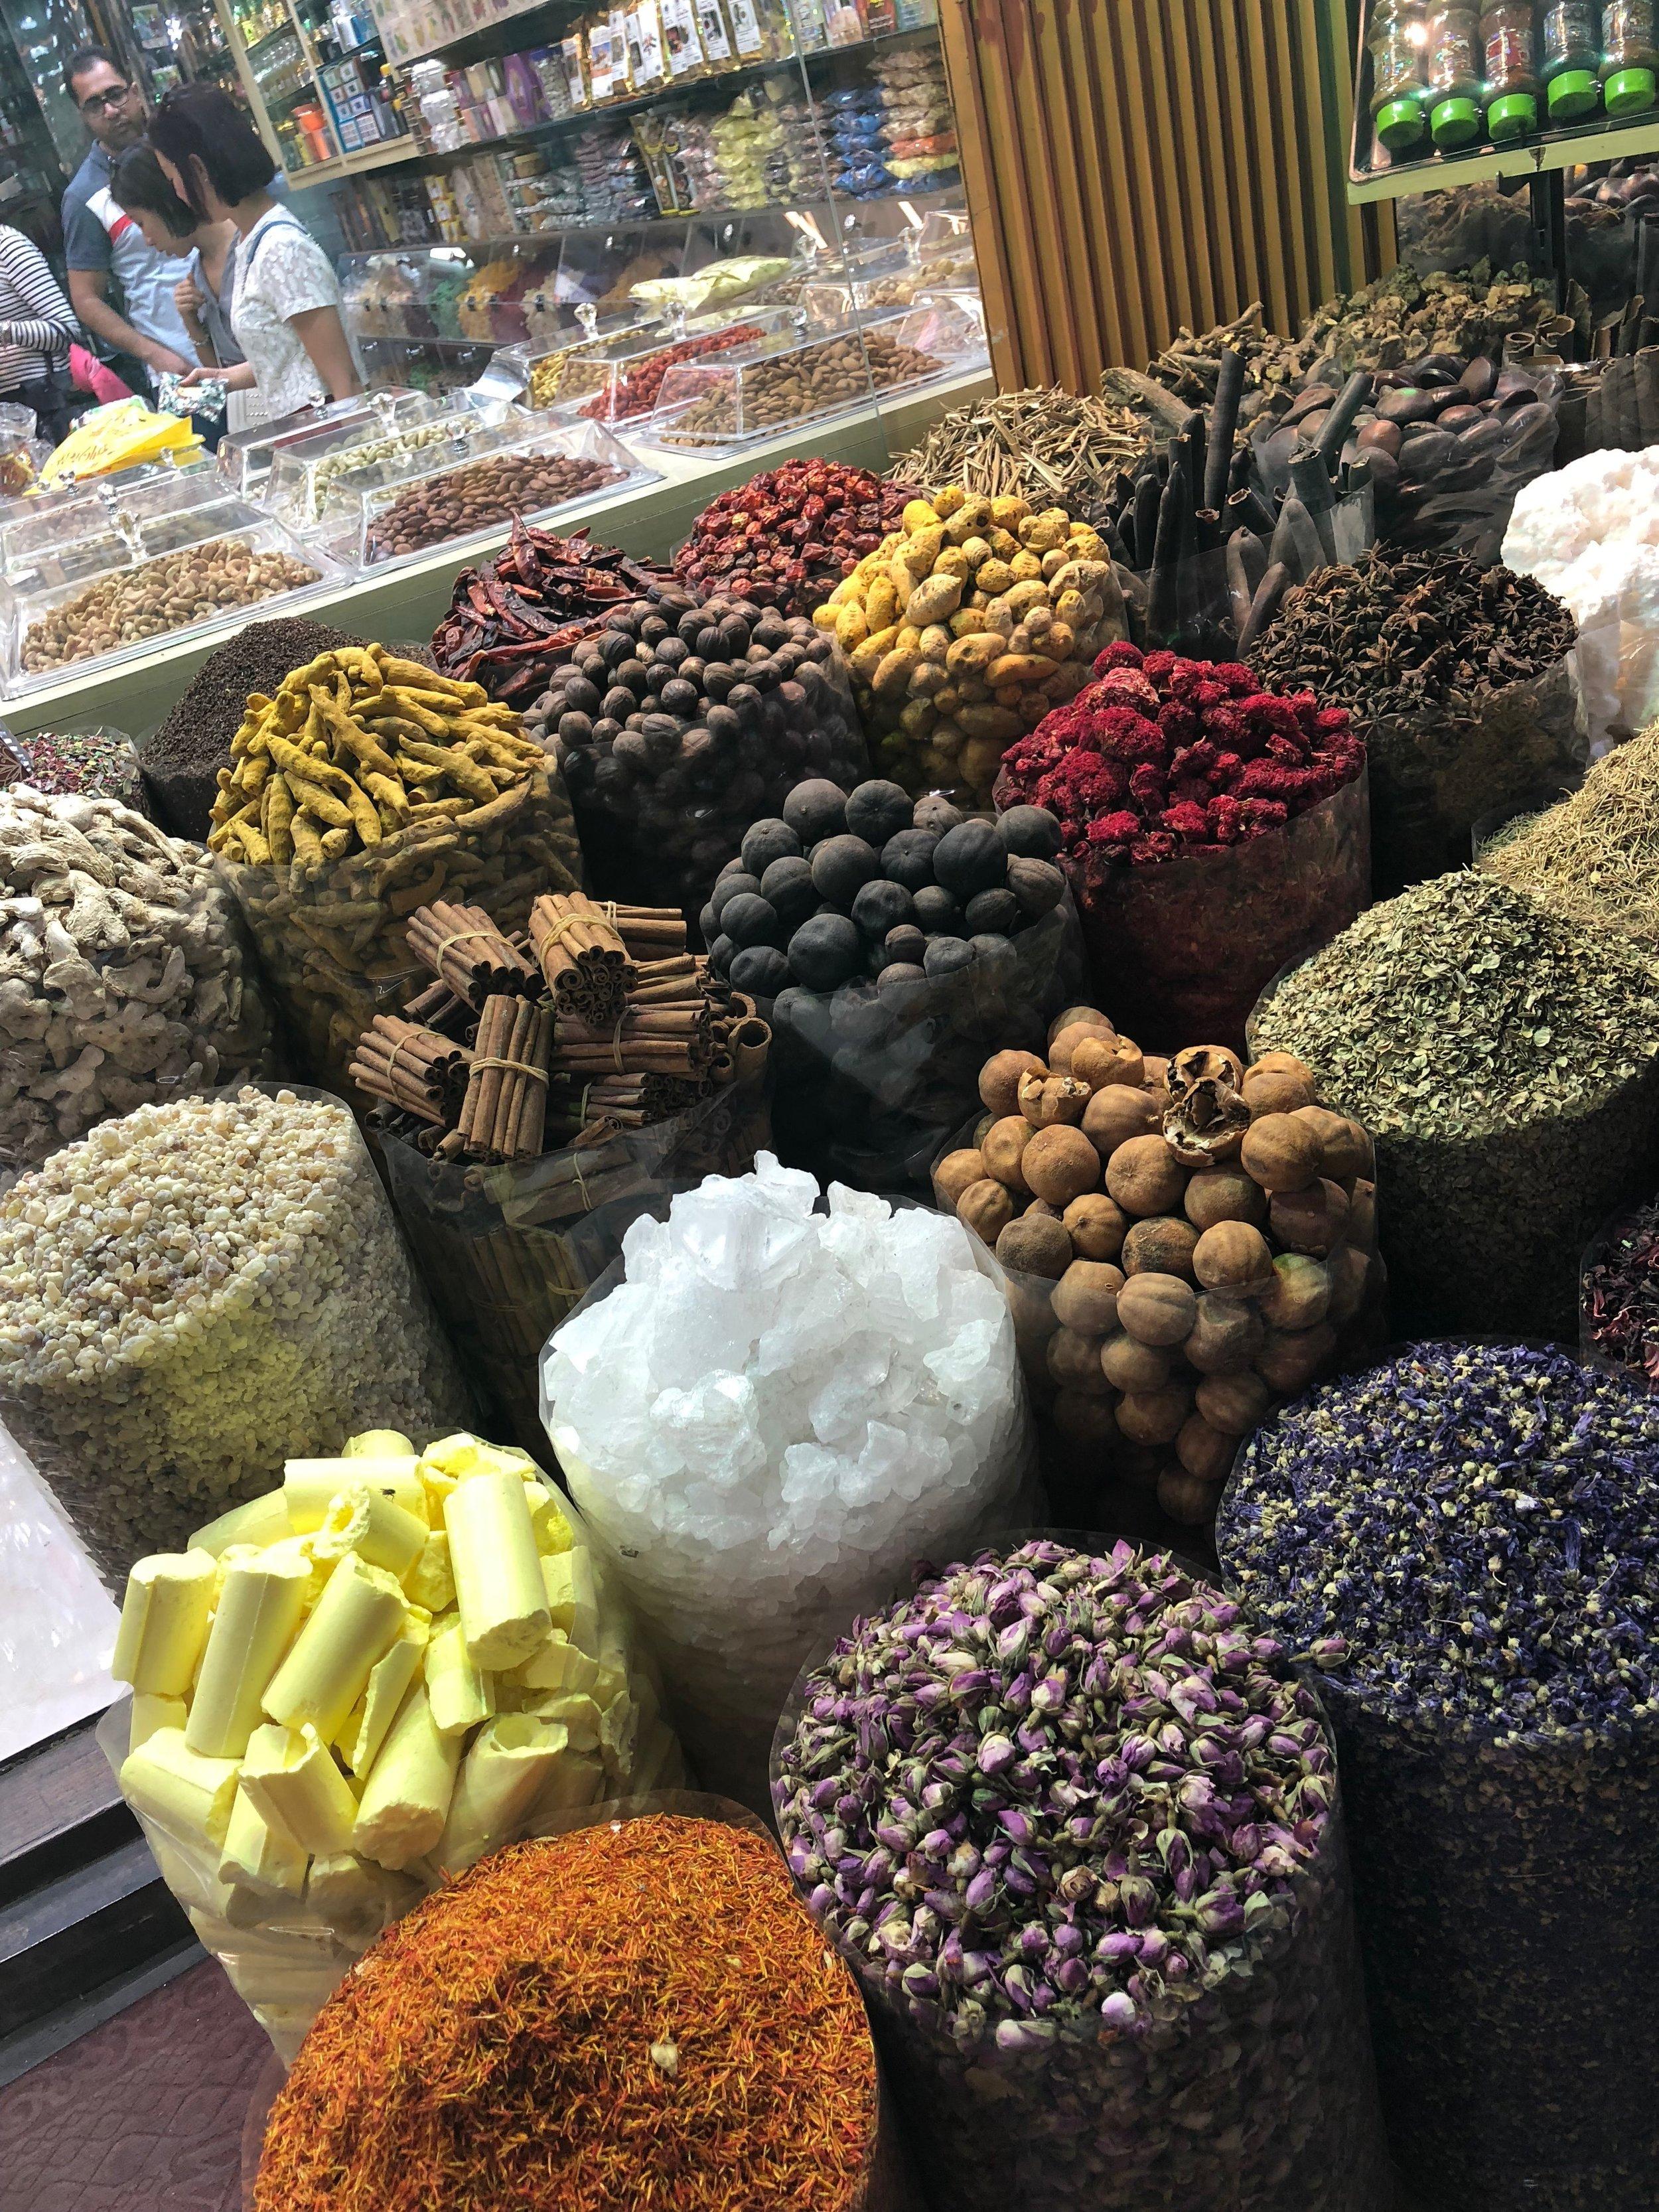 The spice market.....